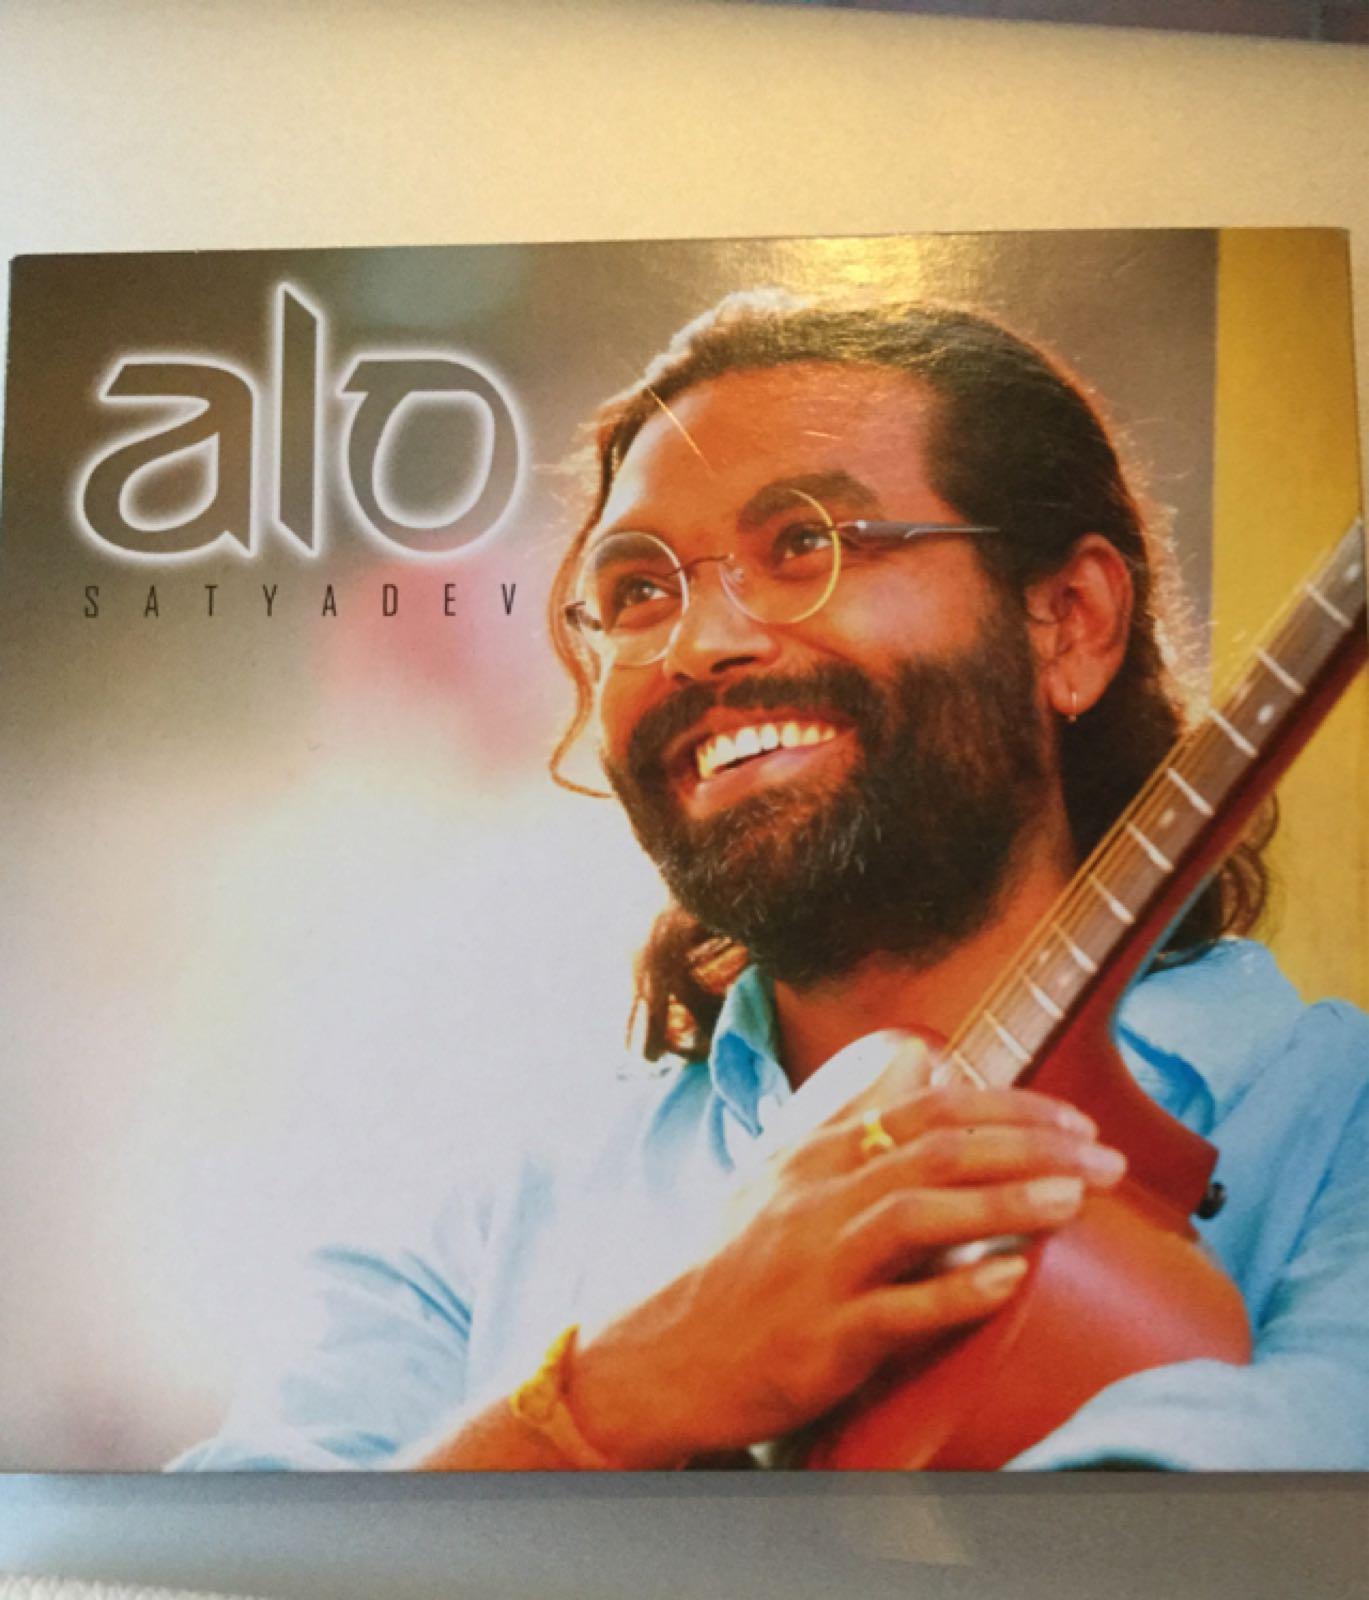 CD Alo - Satyadev 129:-